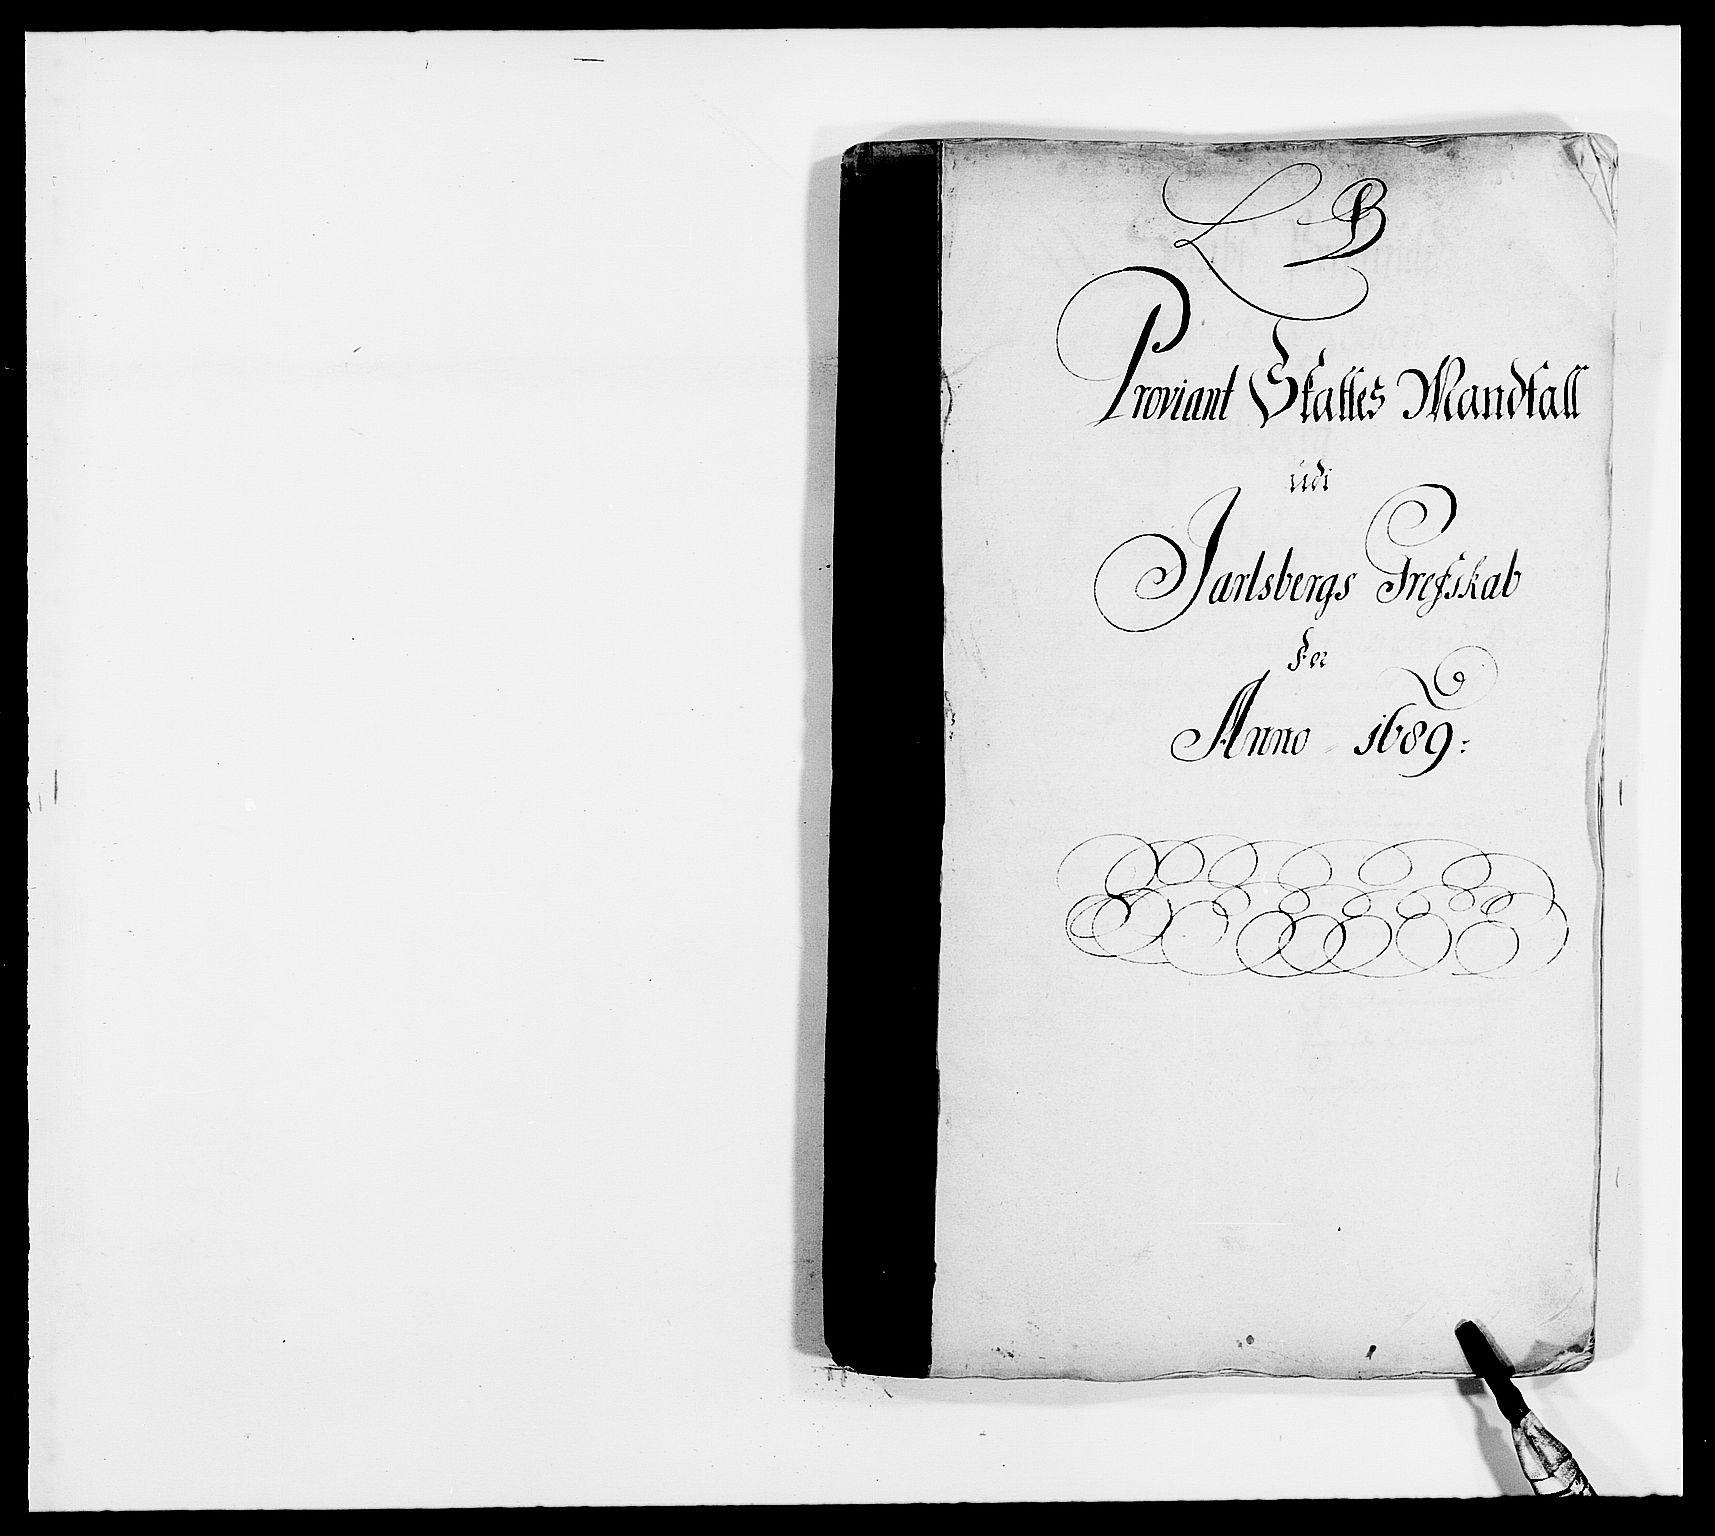 RA, Rentekammeret inntil 1814, Reviderte regnskaper, Fogderegnskap, R32/L1860: Fogderegnskap Jarlsberg grevskap, 1686-1690, s. 79